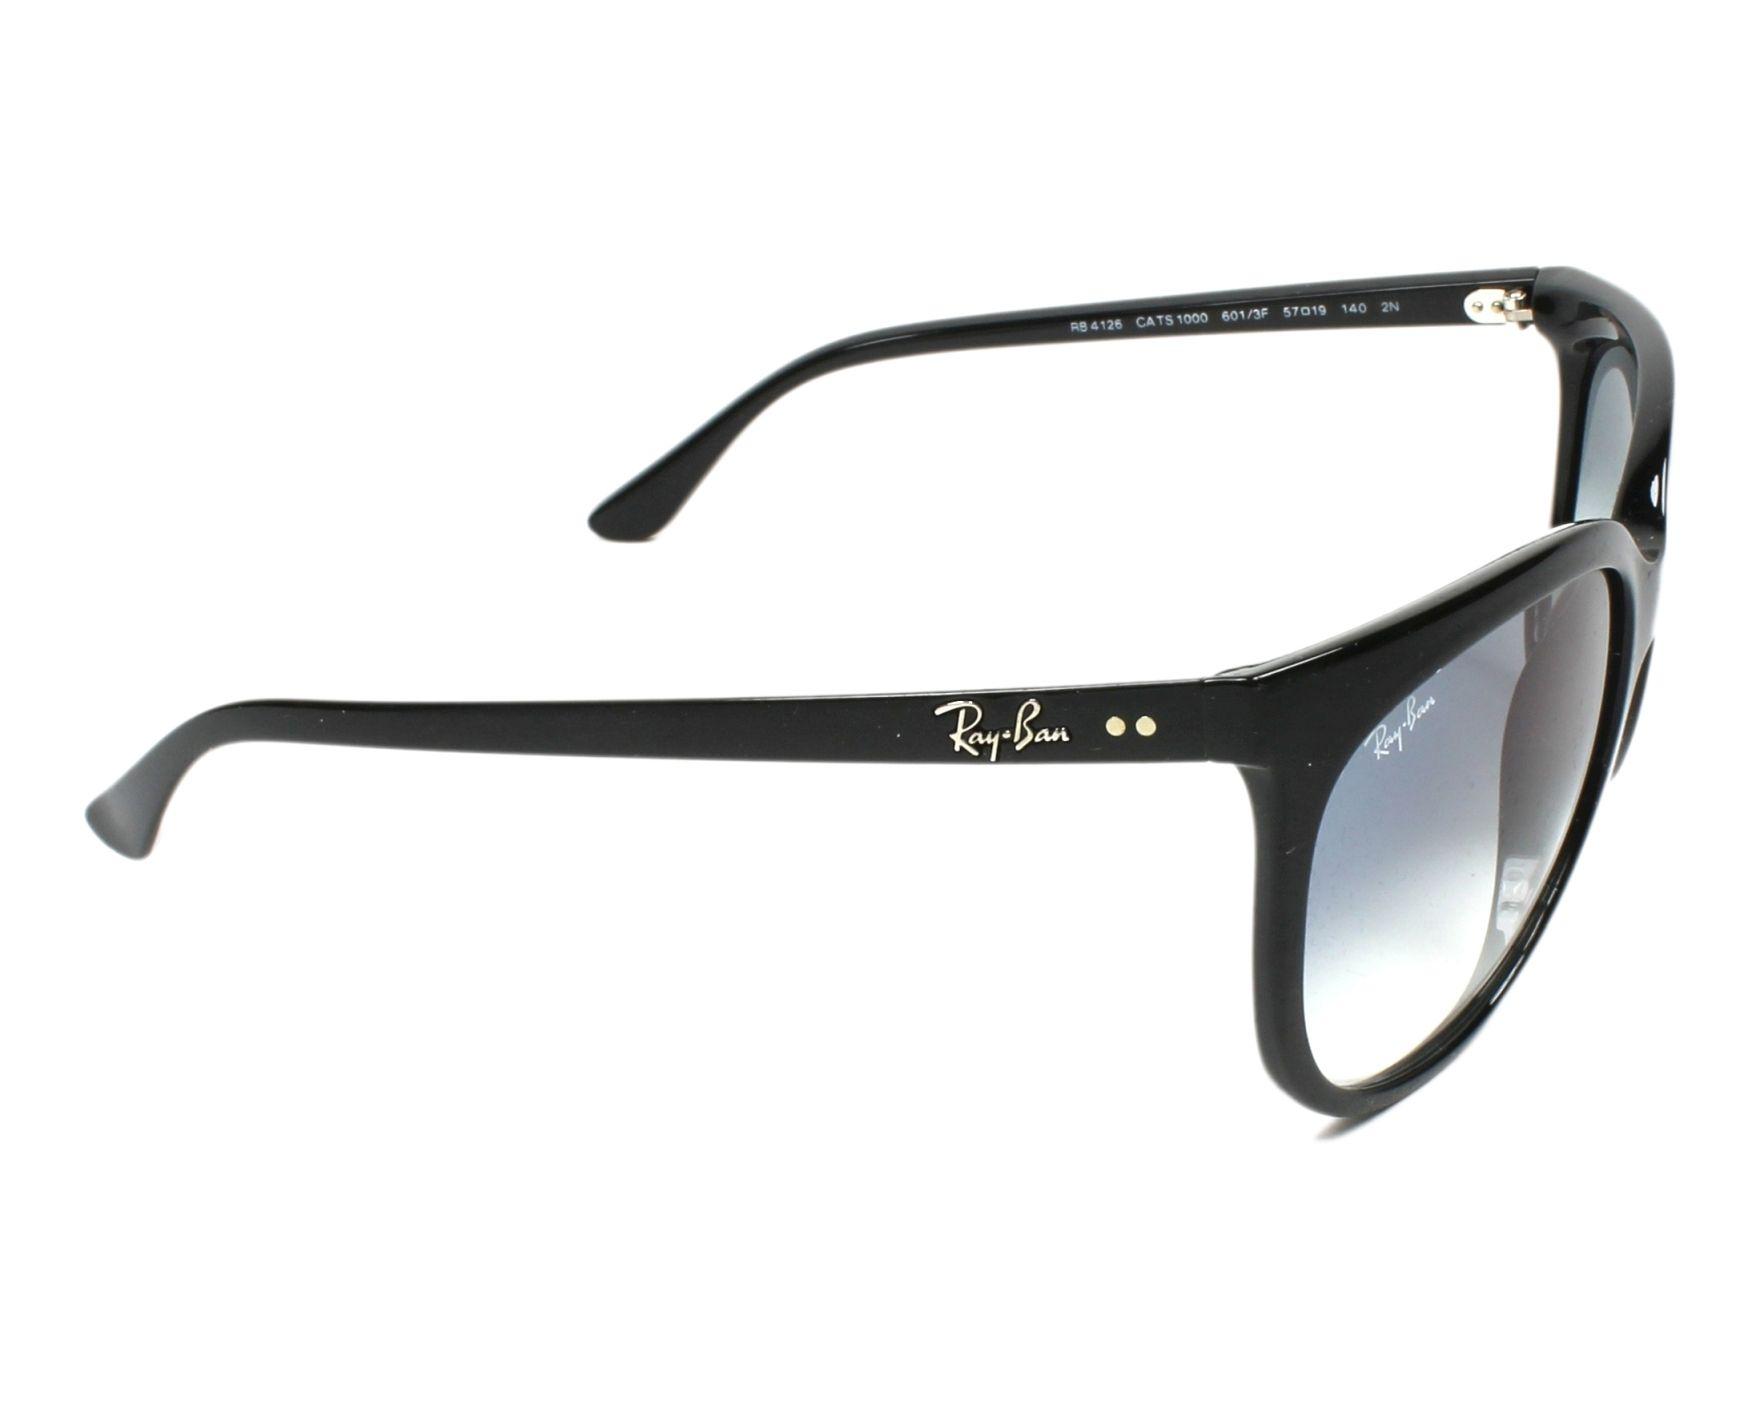 398c680df7 Sunglasses Ray-Ban RB-4126 601 3F 57-15 Black side view